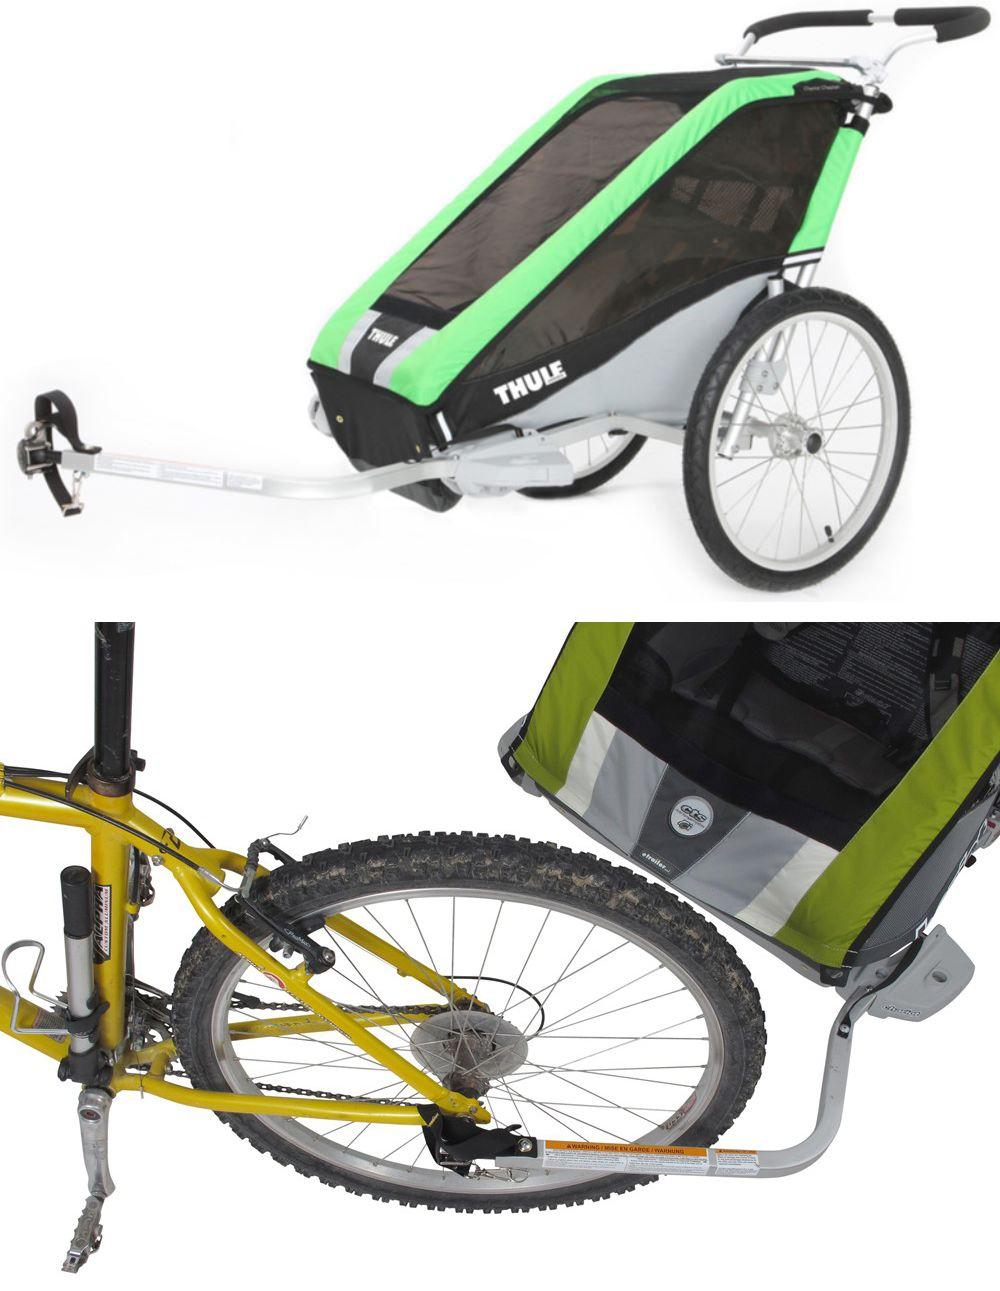 Thule Cheetah Bike Trailer and Stroller in Green. Super